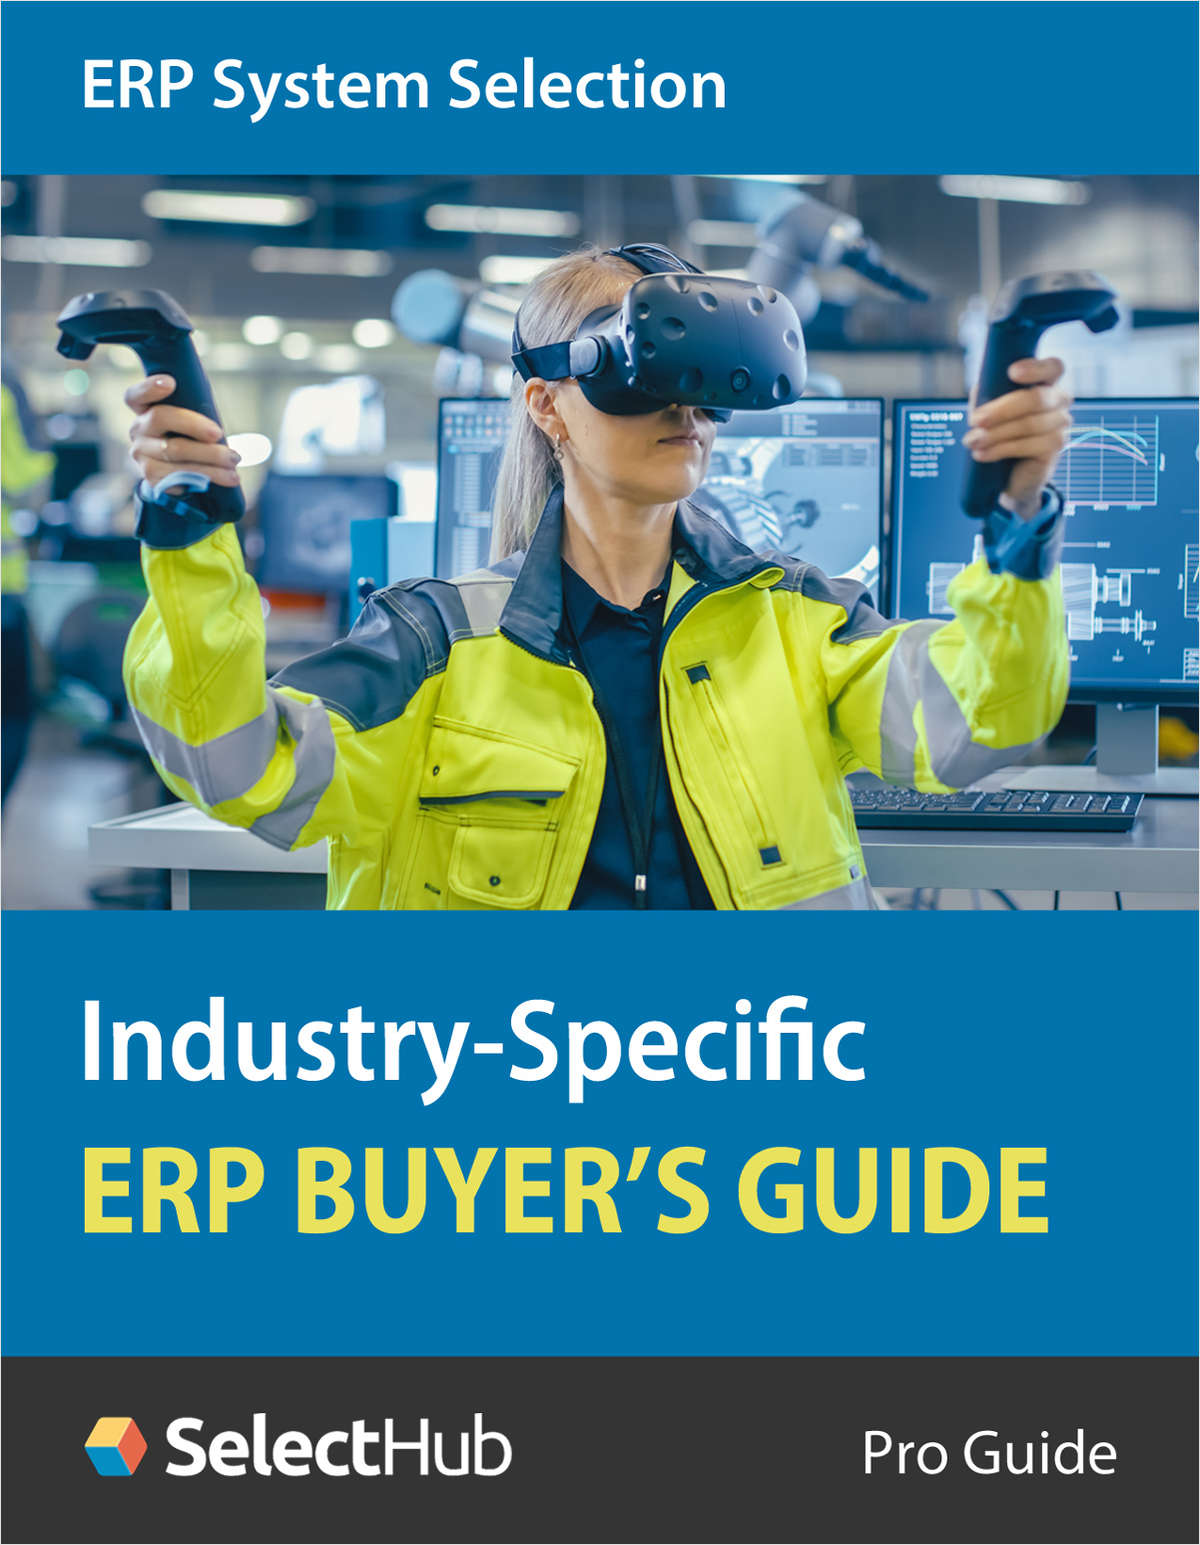 Industry-Specific ERP Software Buyer's Guide 2021